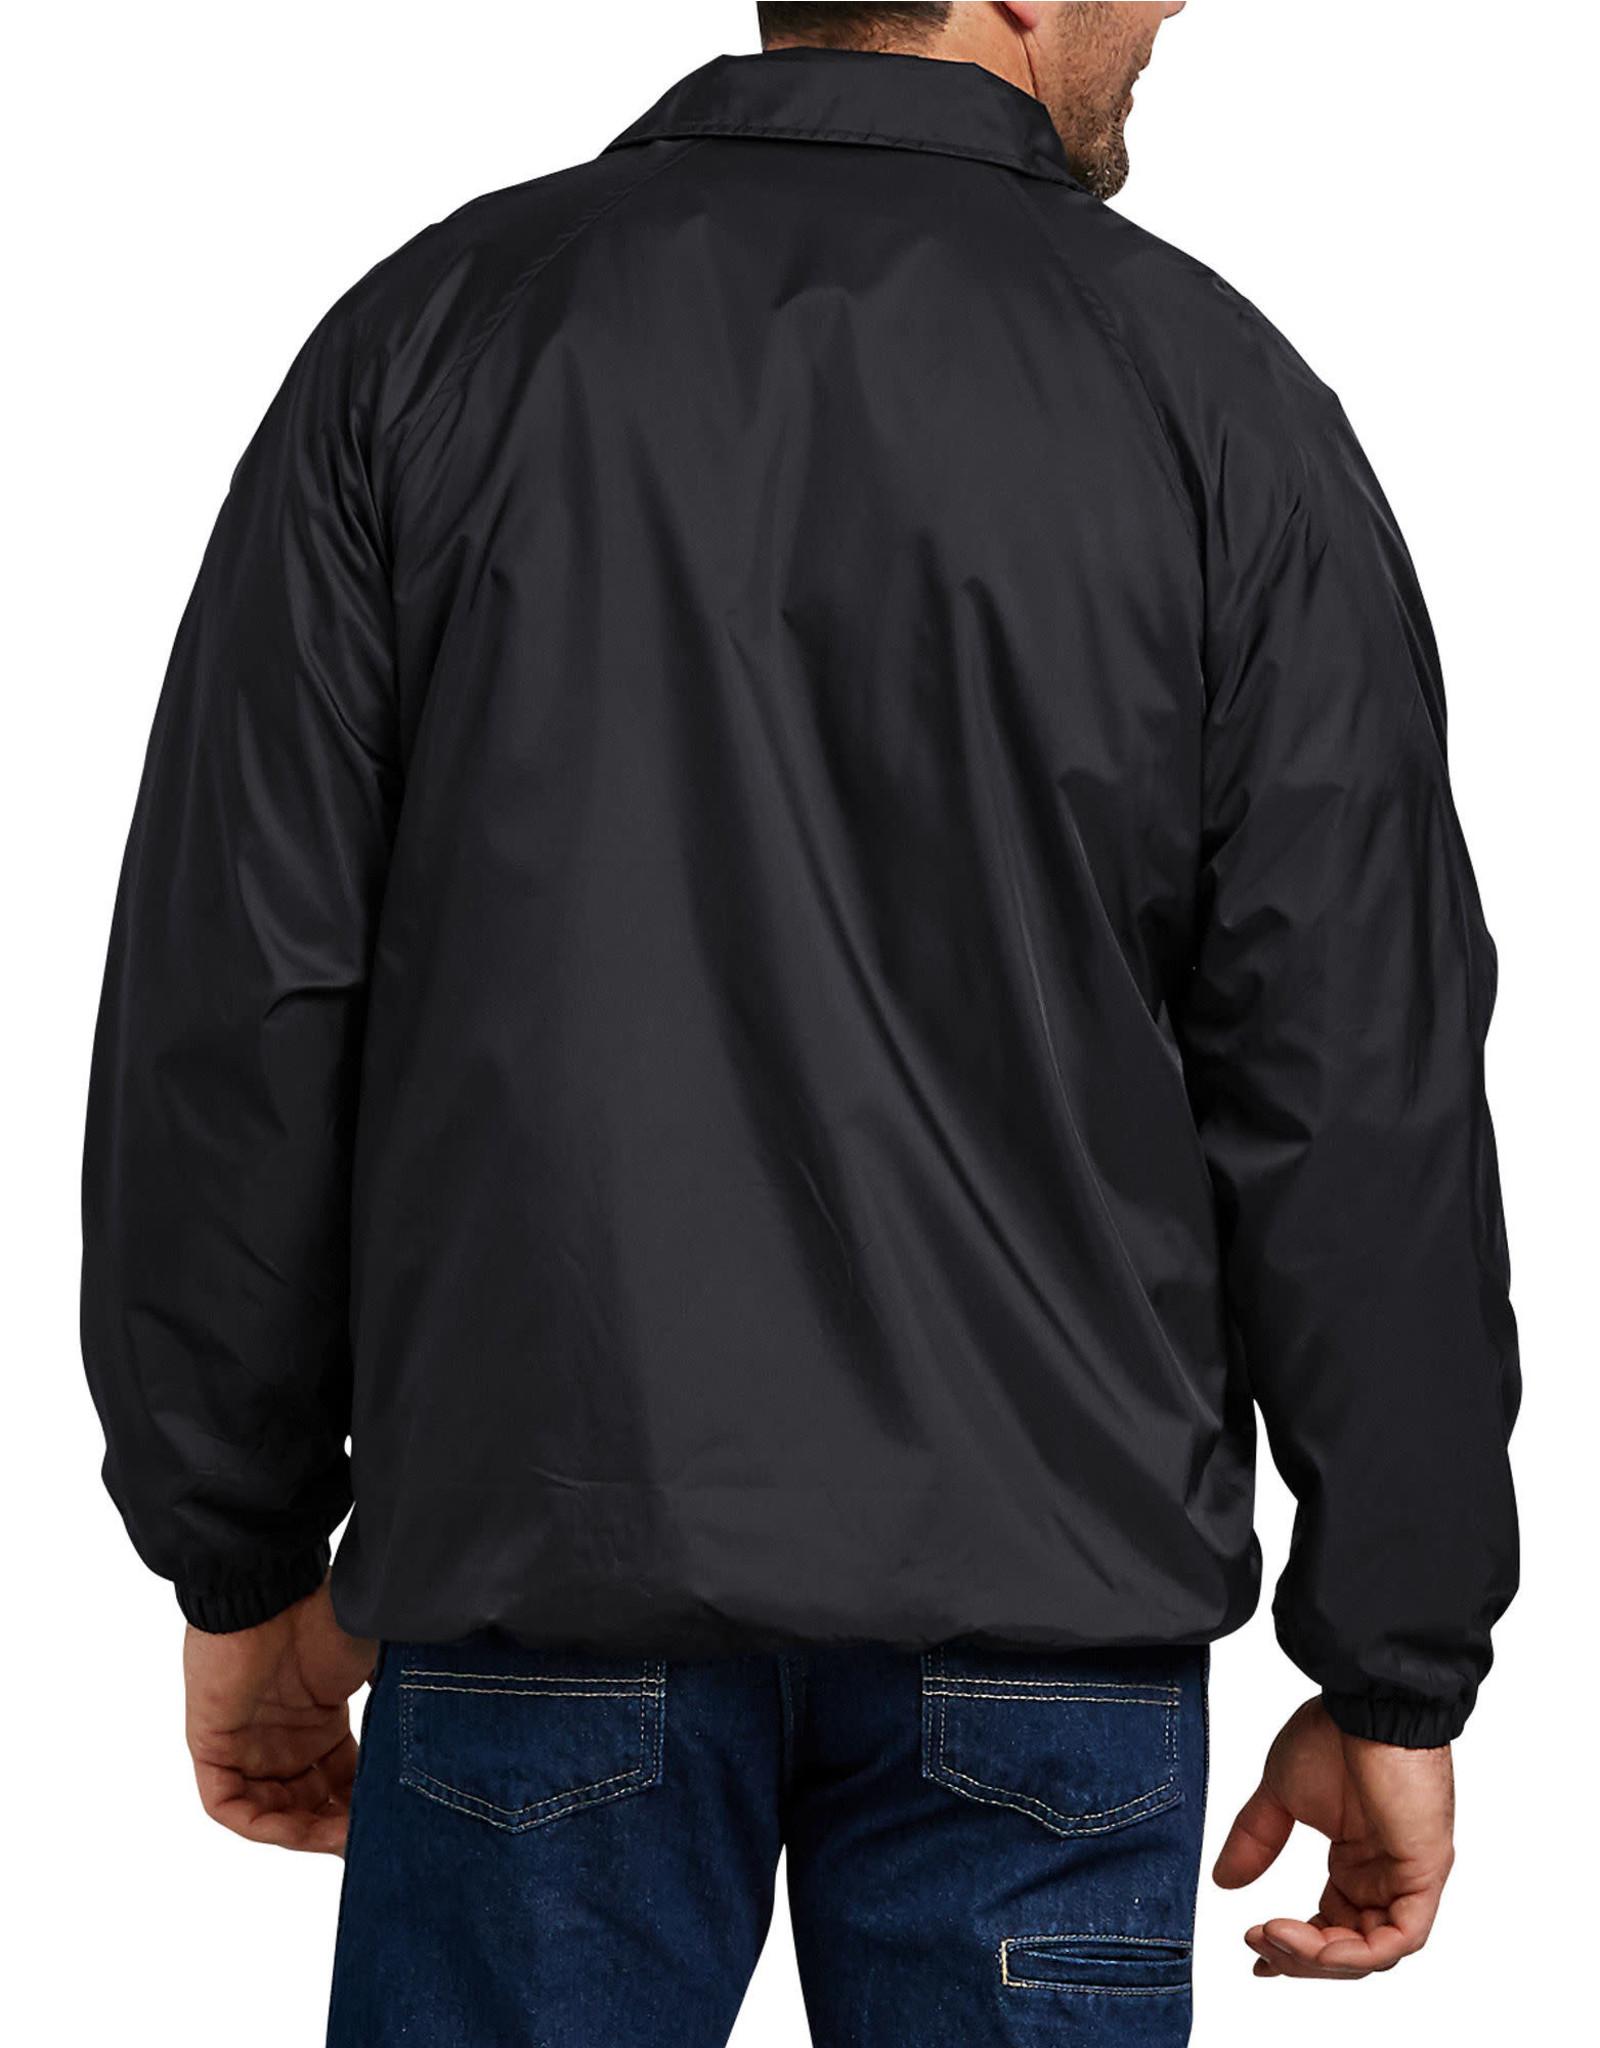 DICKIES Snap Front Nylon Jacket